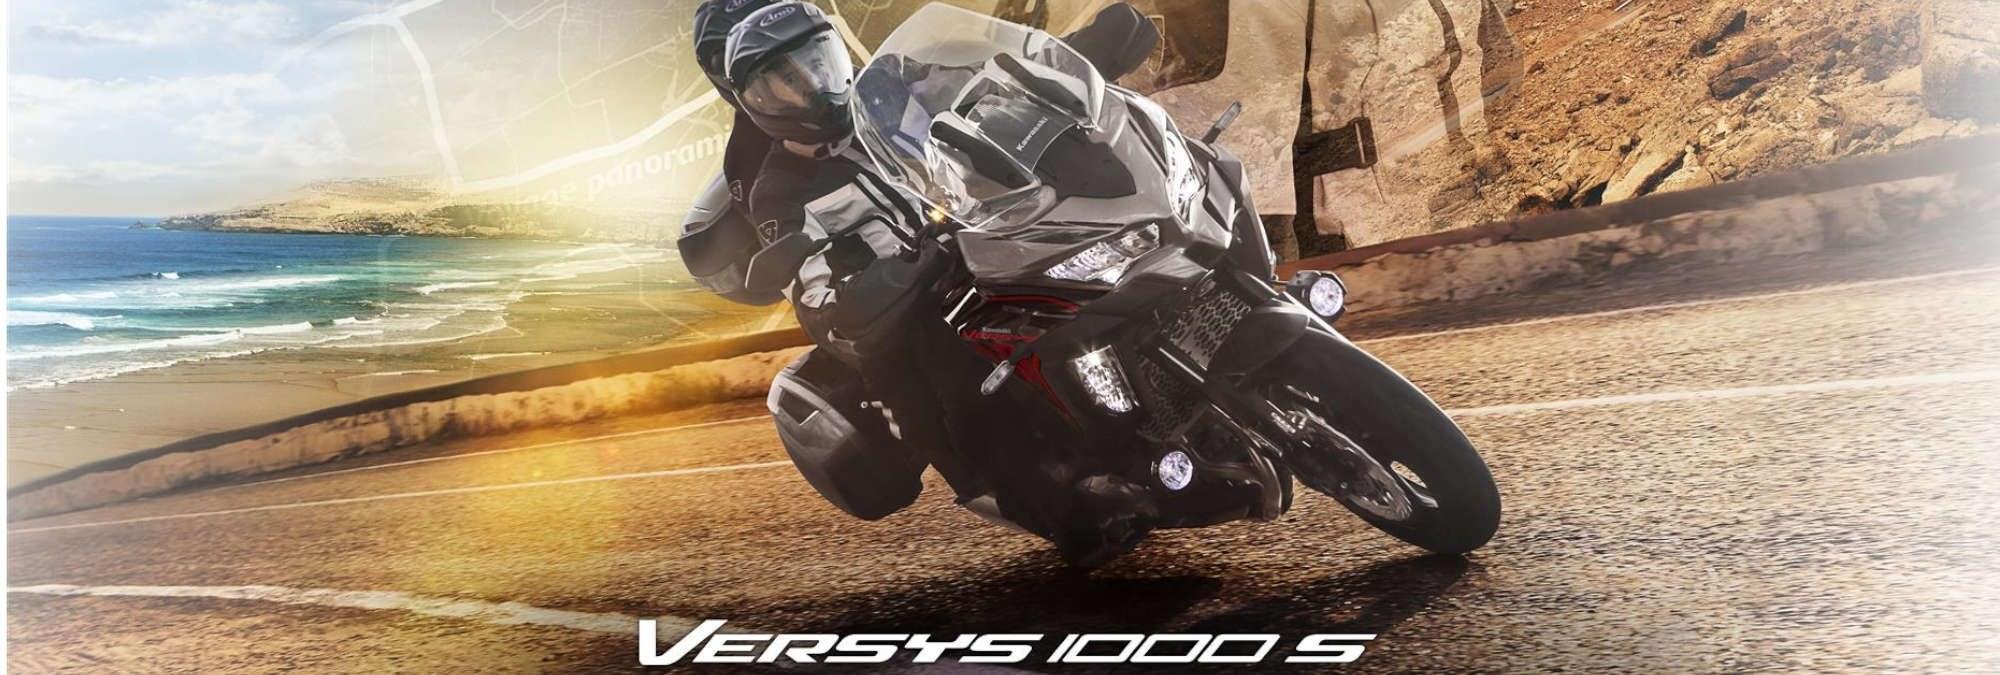 Versys 1000 S